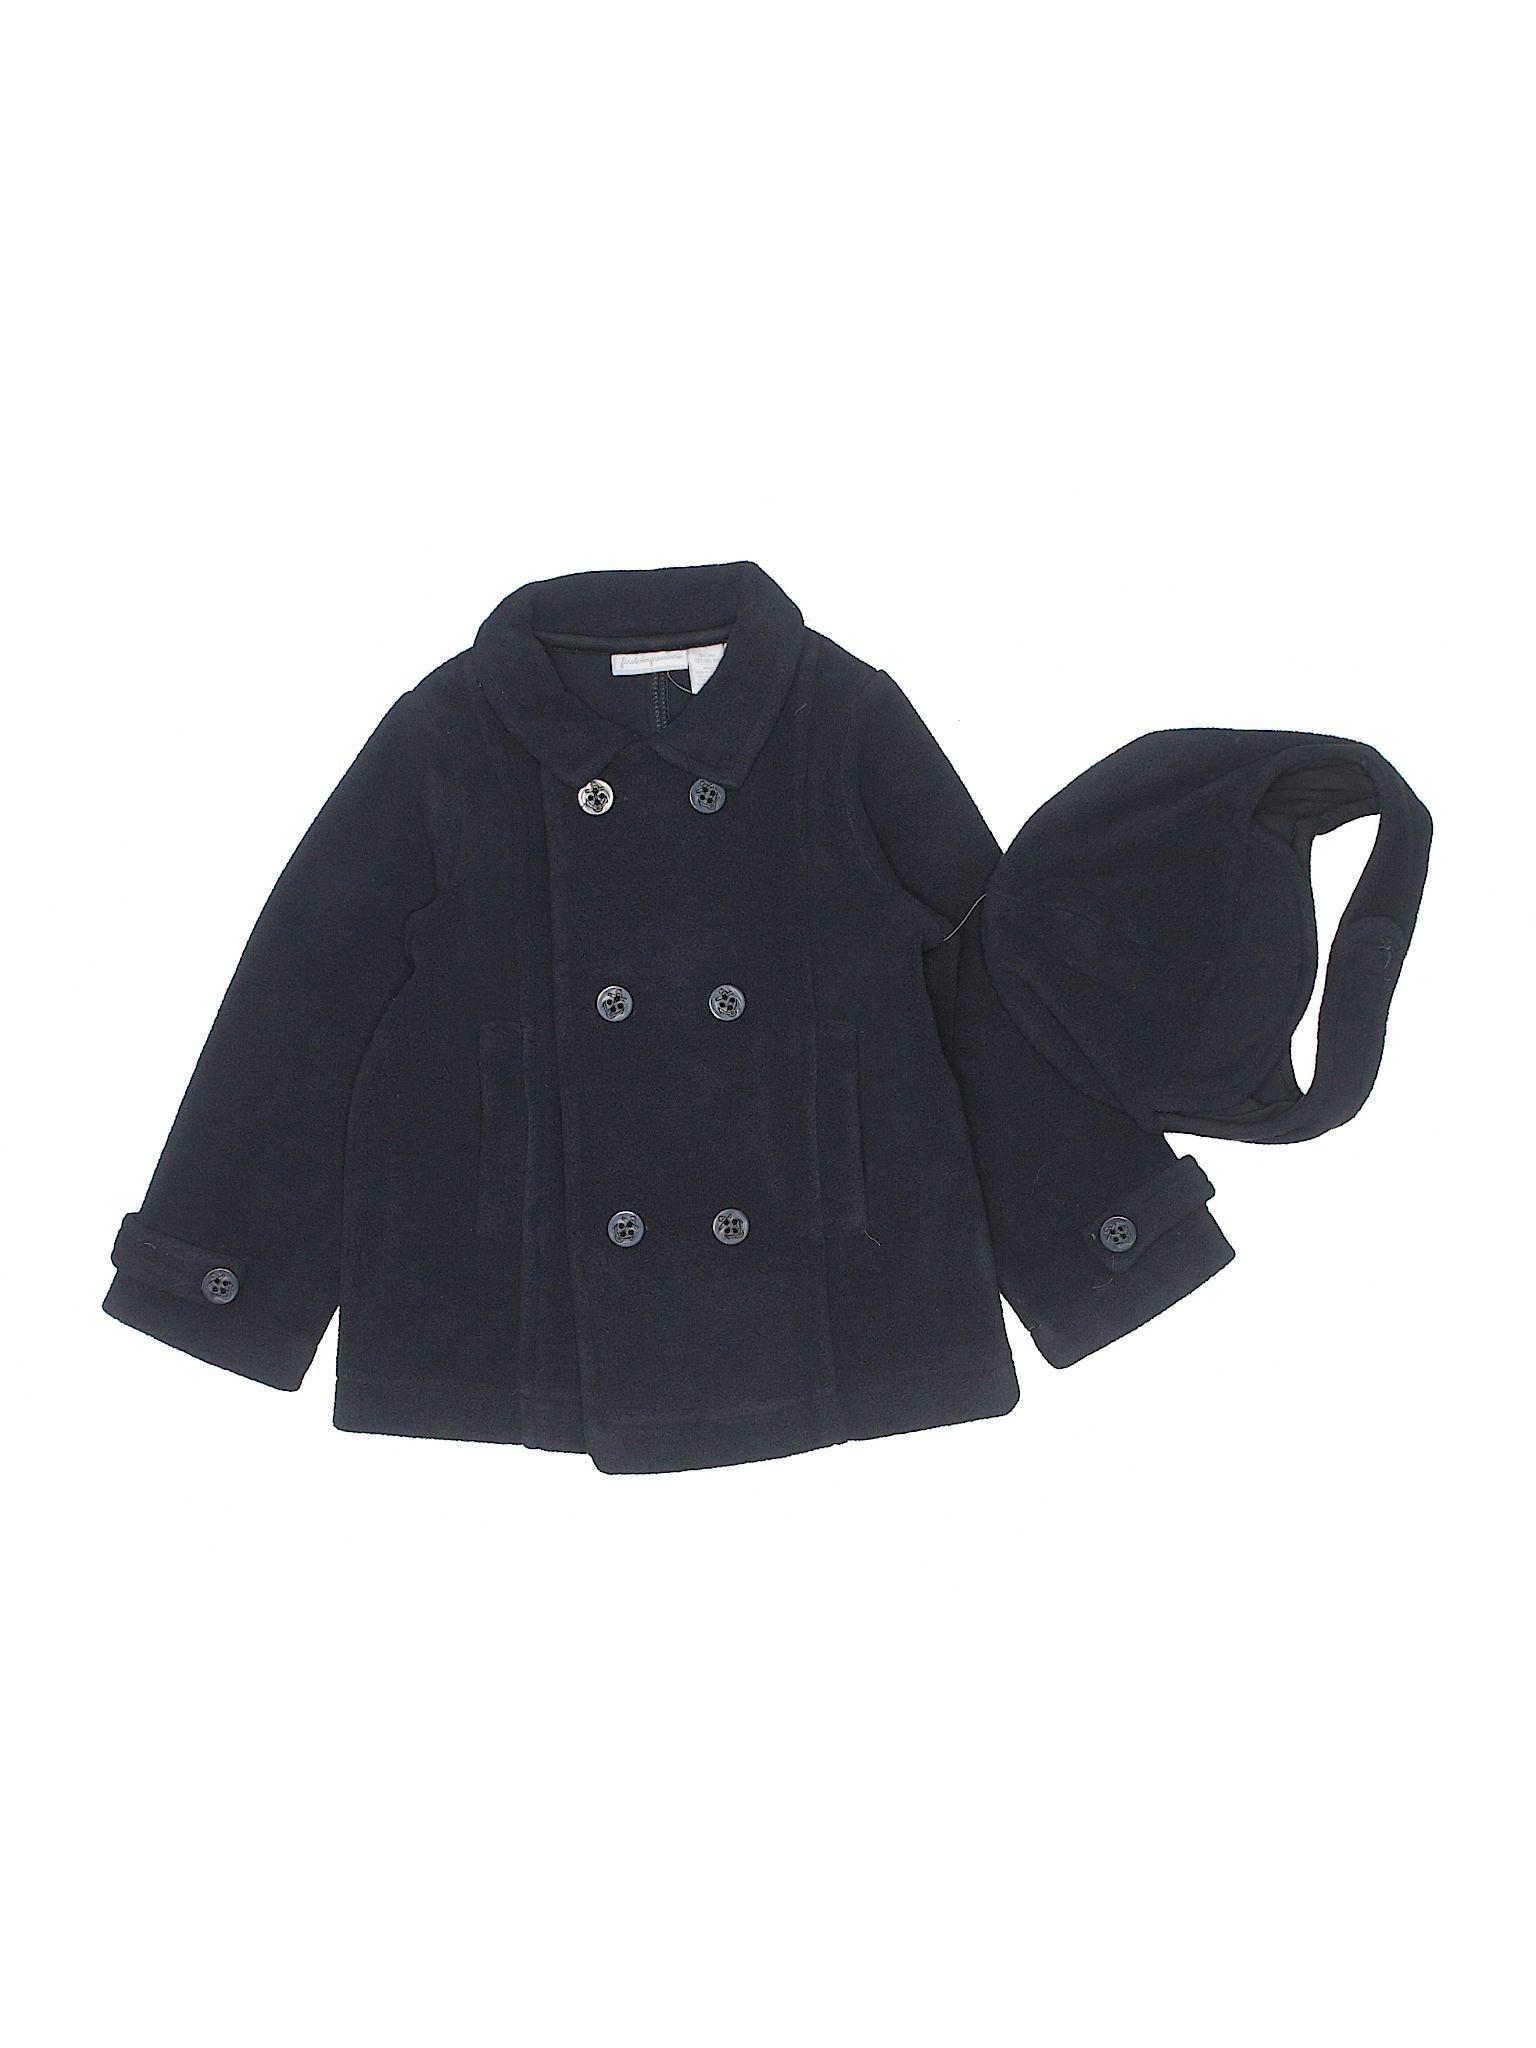 First impressions fleece jacket gray girls jackets u outerwear